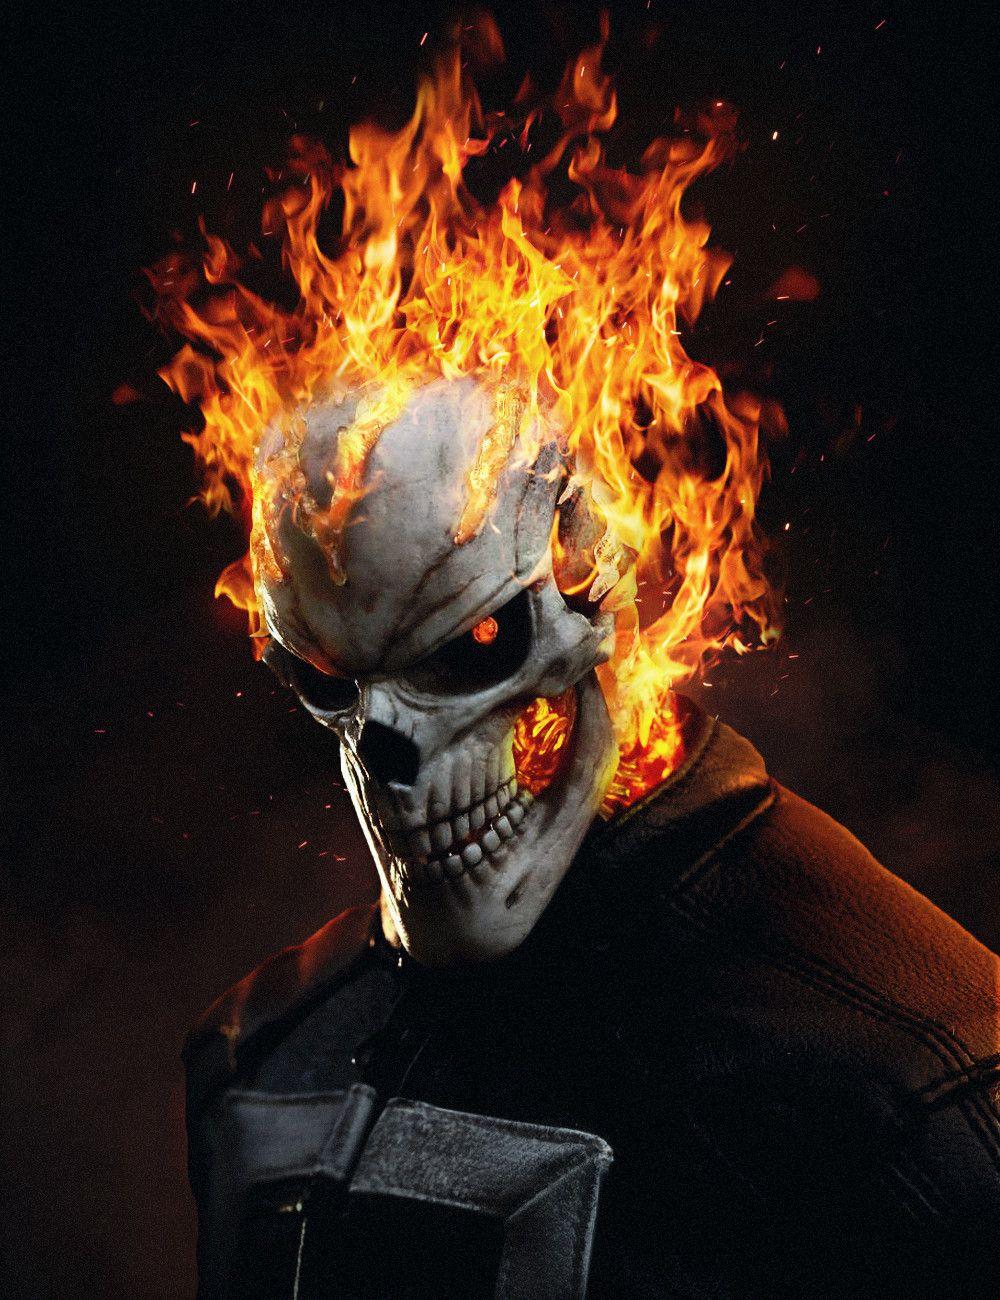 Artstation Agents Of Shield Ghost Rider Aiko Aiham Ghost Rider Wallpaper Ghost Rider Marvel Ghost Rider Tattoo